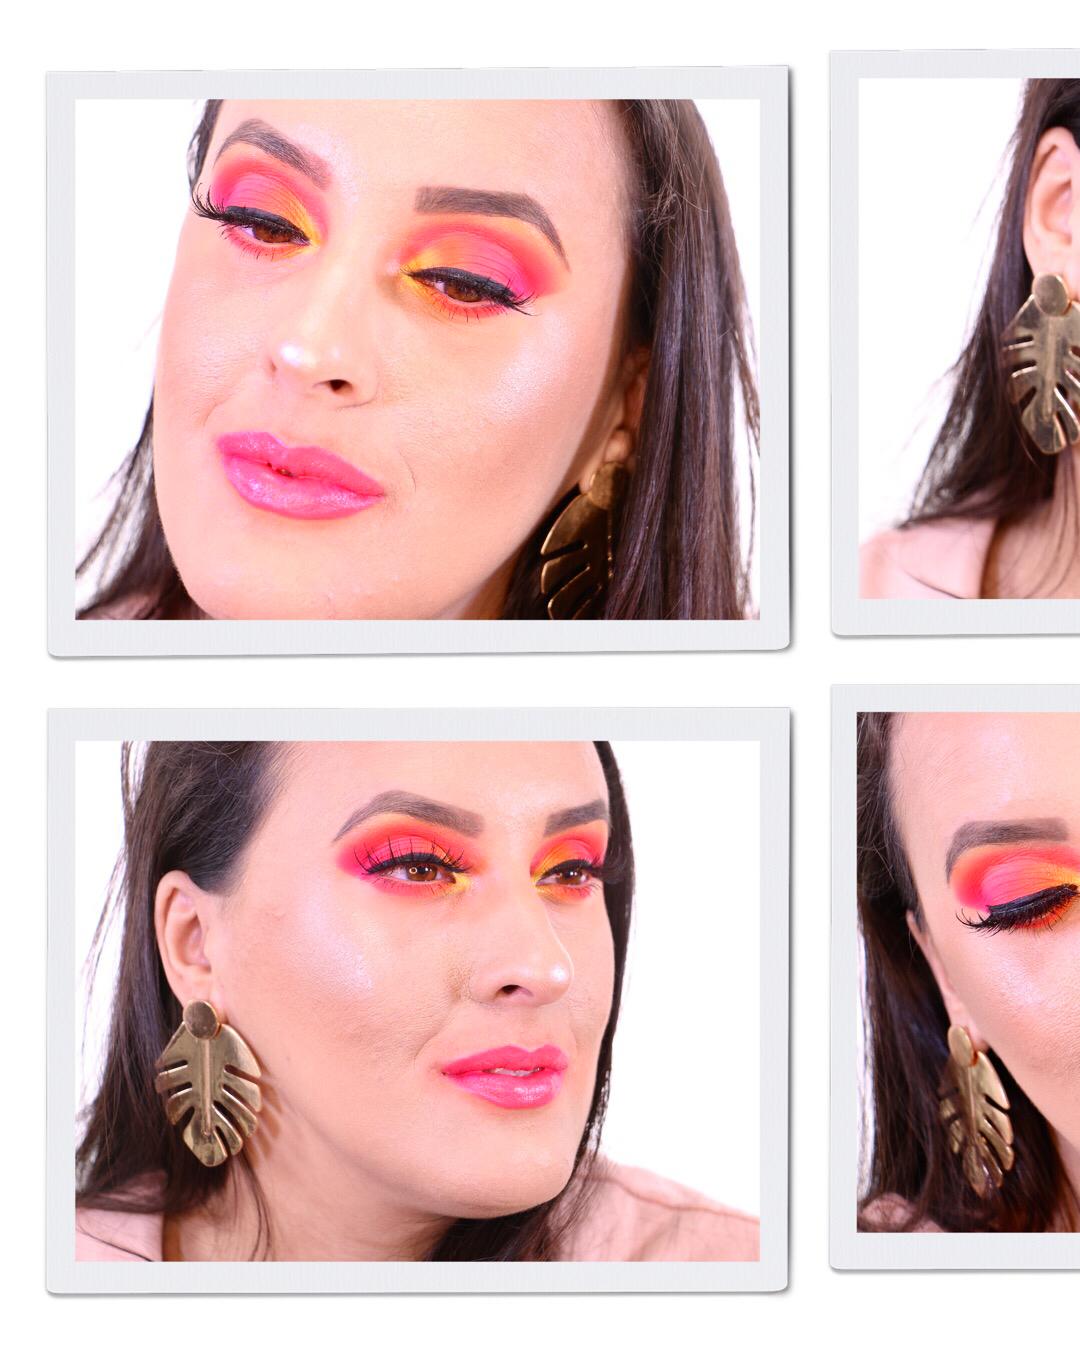 BOLD-NEON-Huda-Beauty-Neon-Obsessions-Vivi-Brizuela